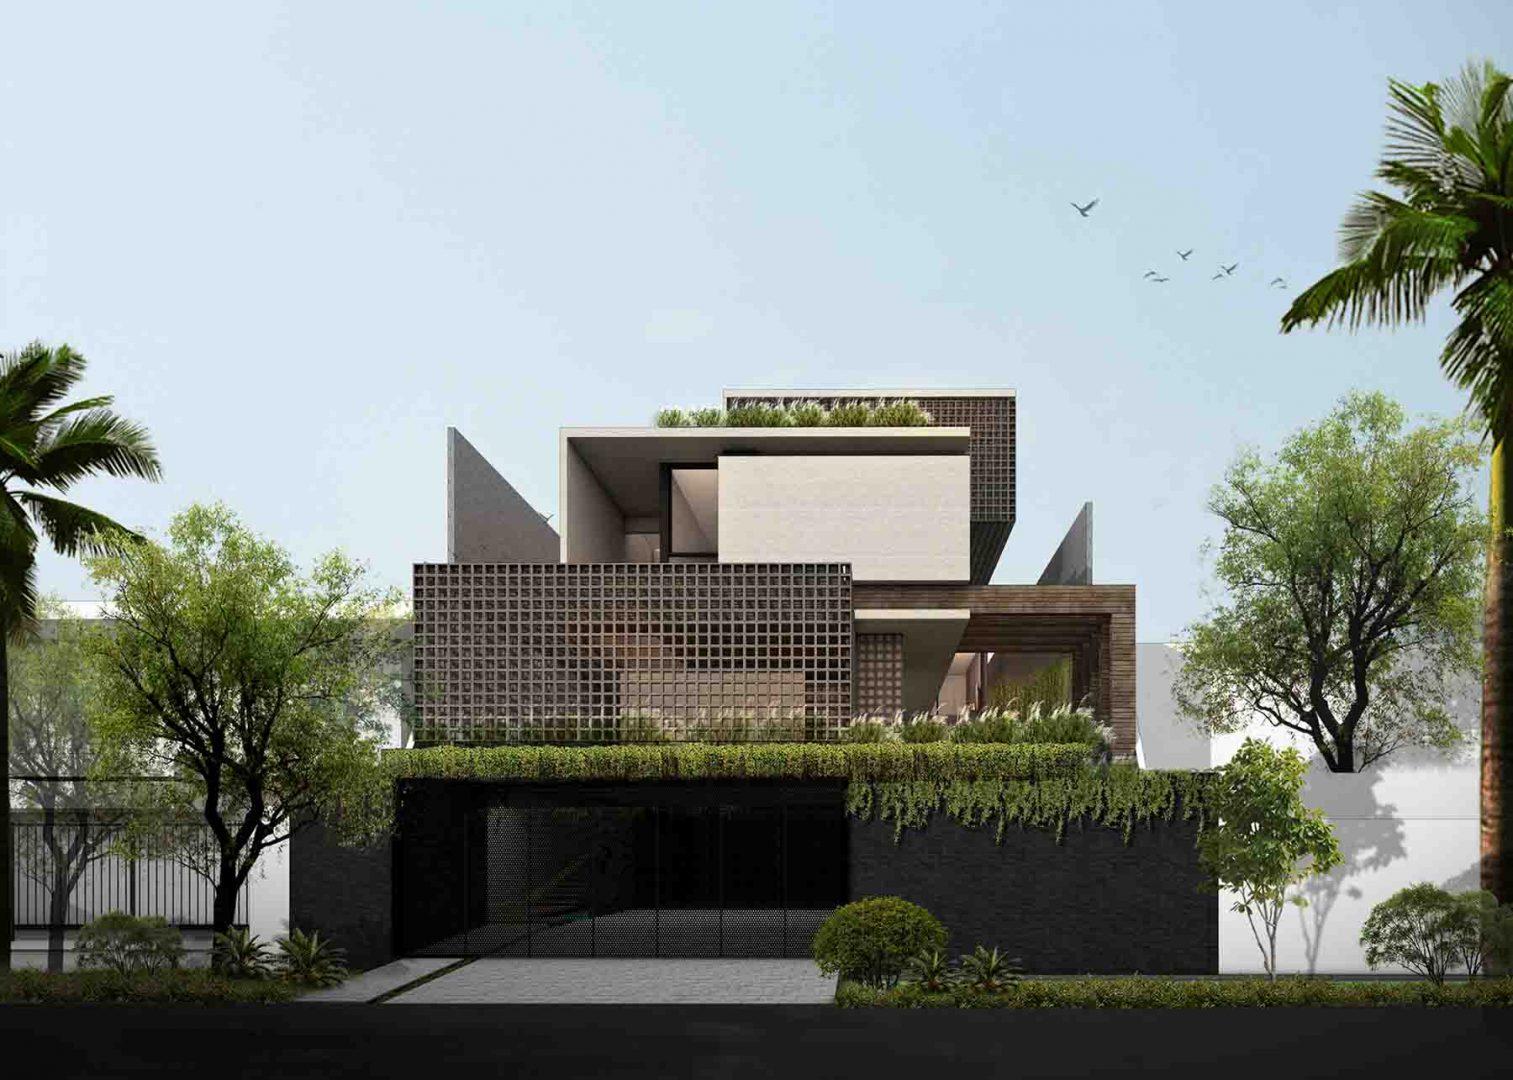 MAIN FLOWER HOUSE - Image 2